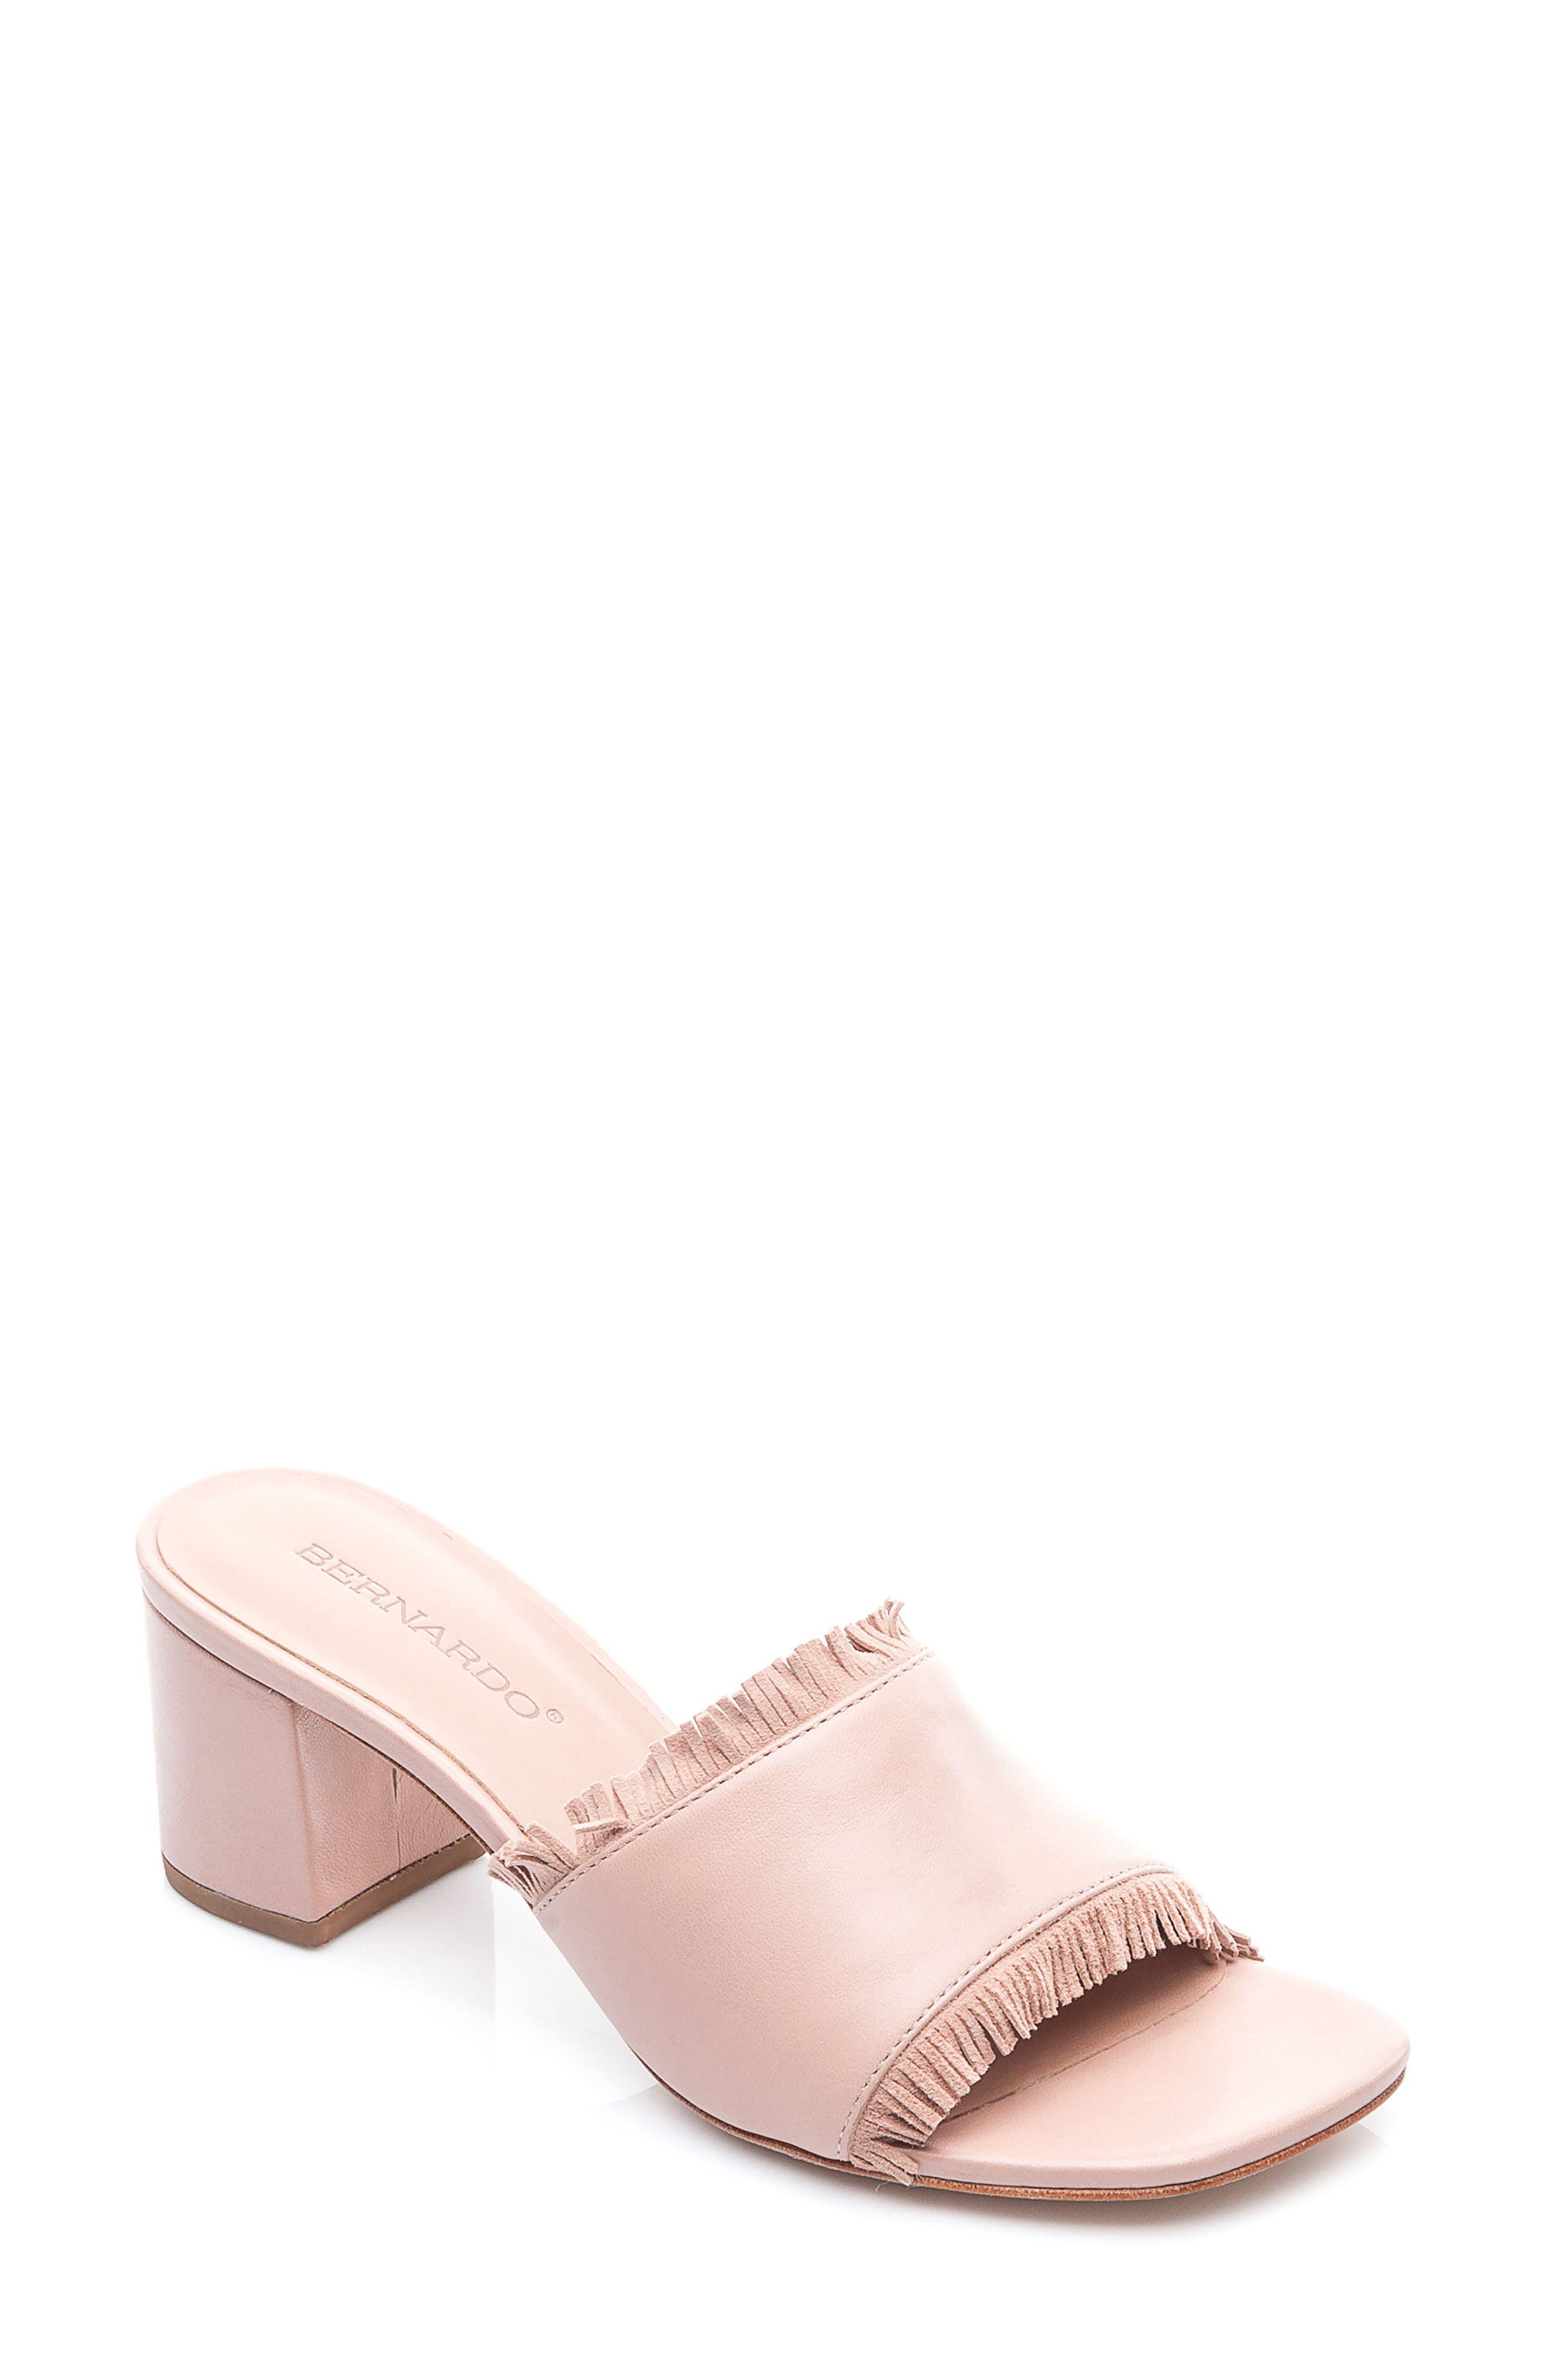 Bernardo Blossom Slide Sandal,                             Main thumbnail 1, color,                             Blush Leather